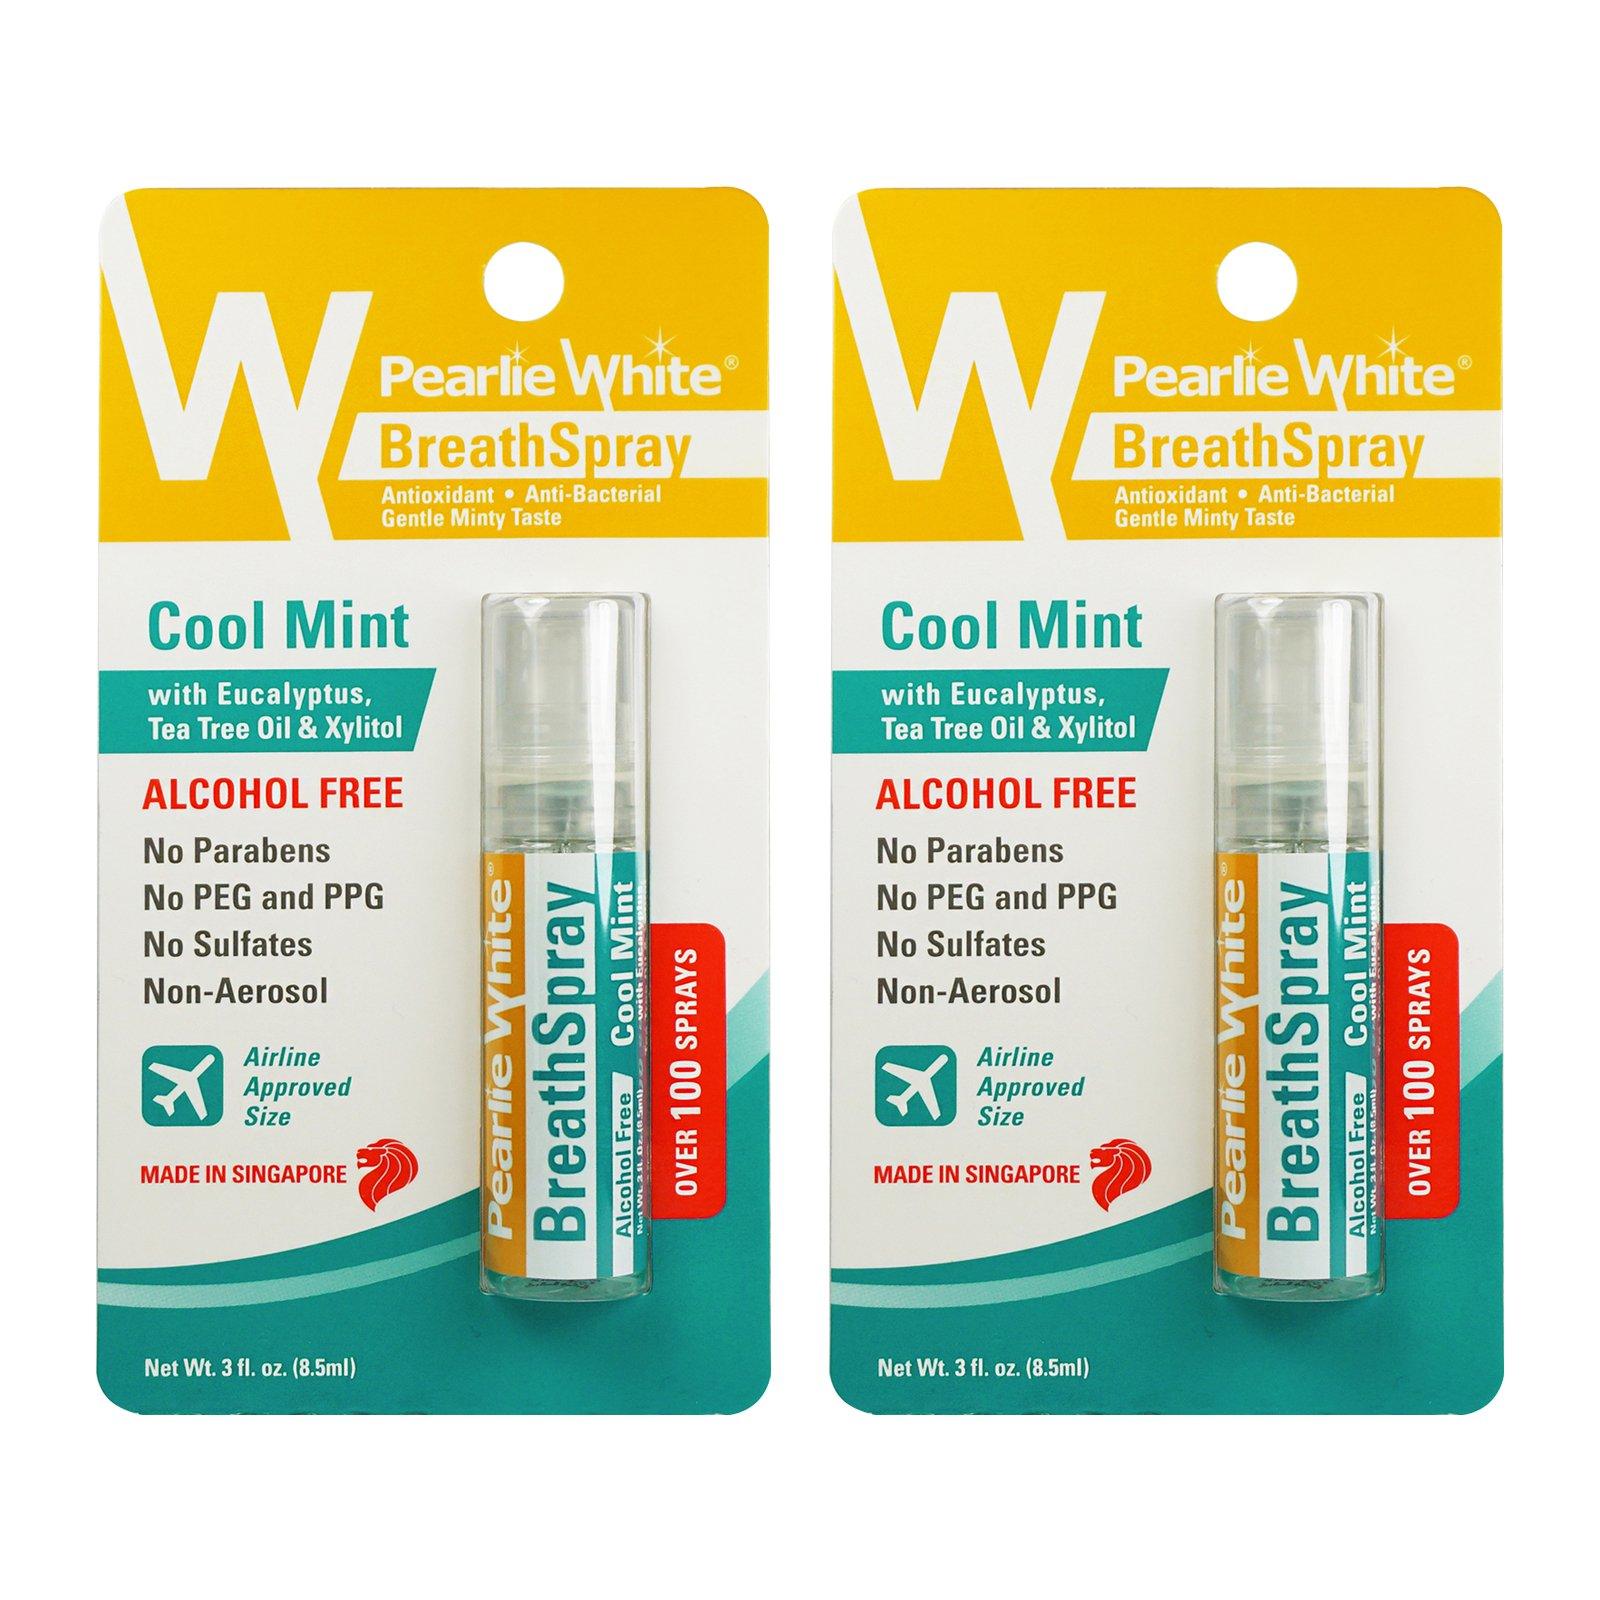 Pearlie White BreathSpray 8.5ml (100 Sprays) - Cool Mint, Pack of 2